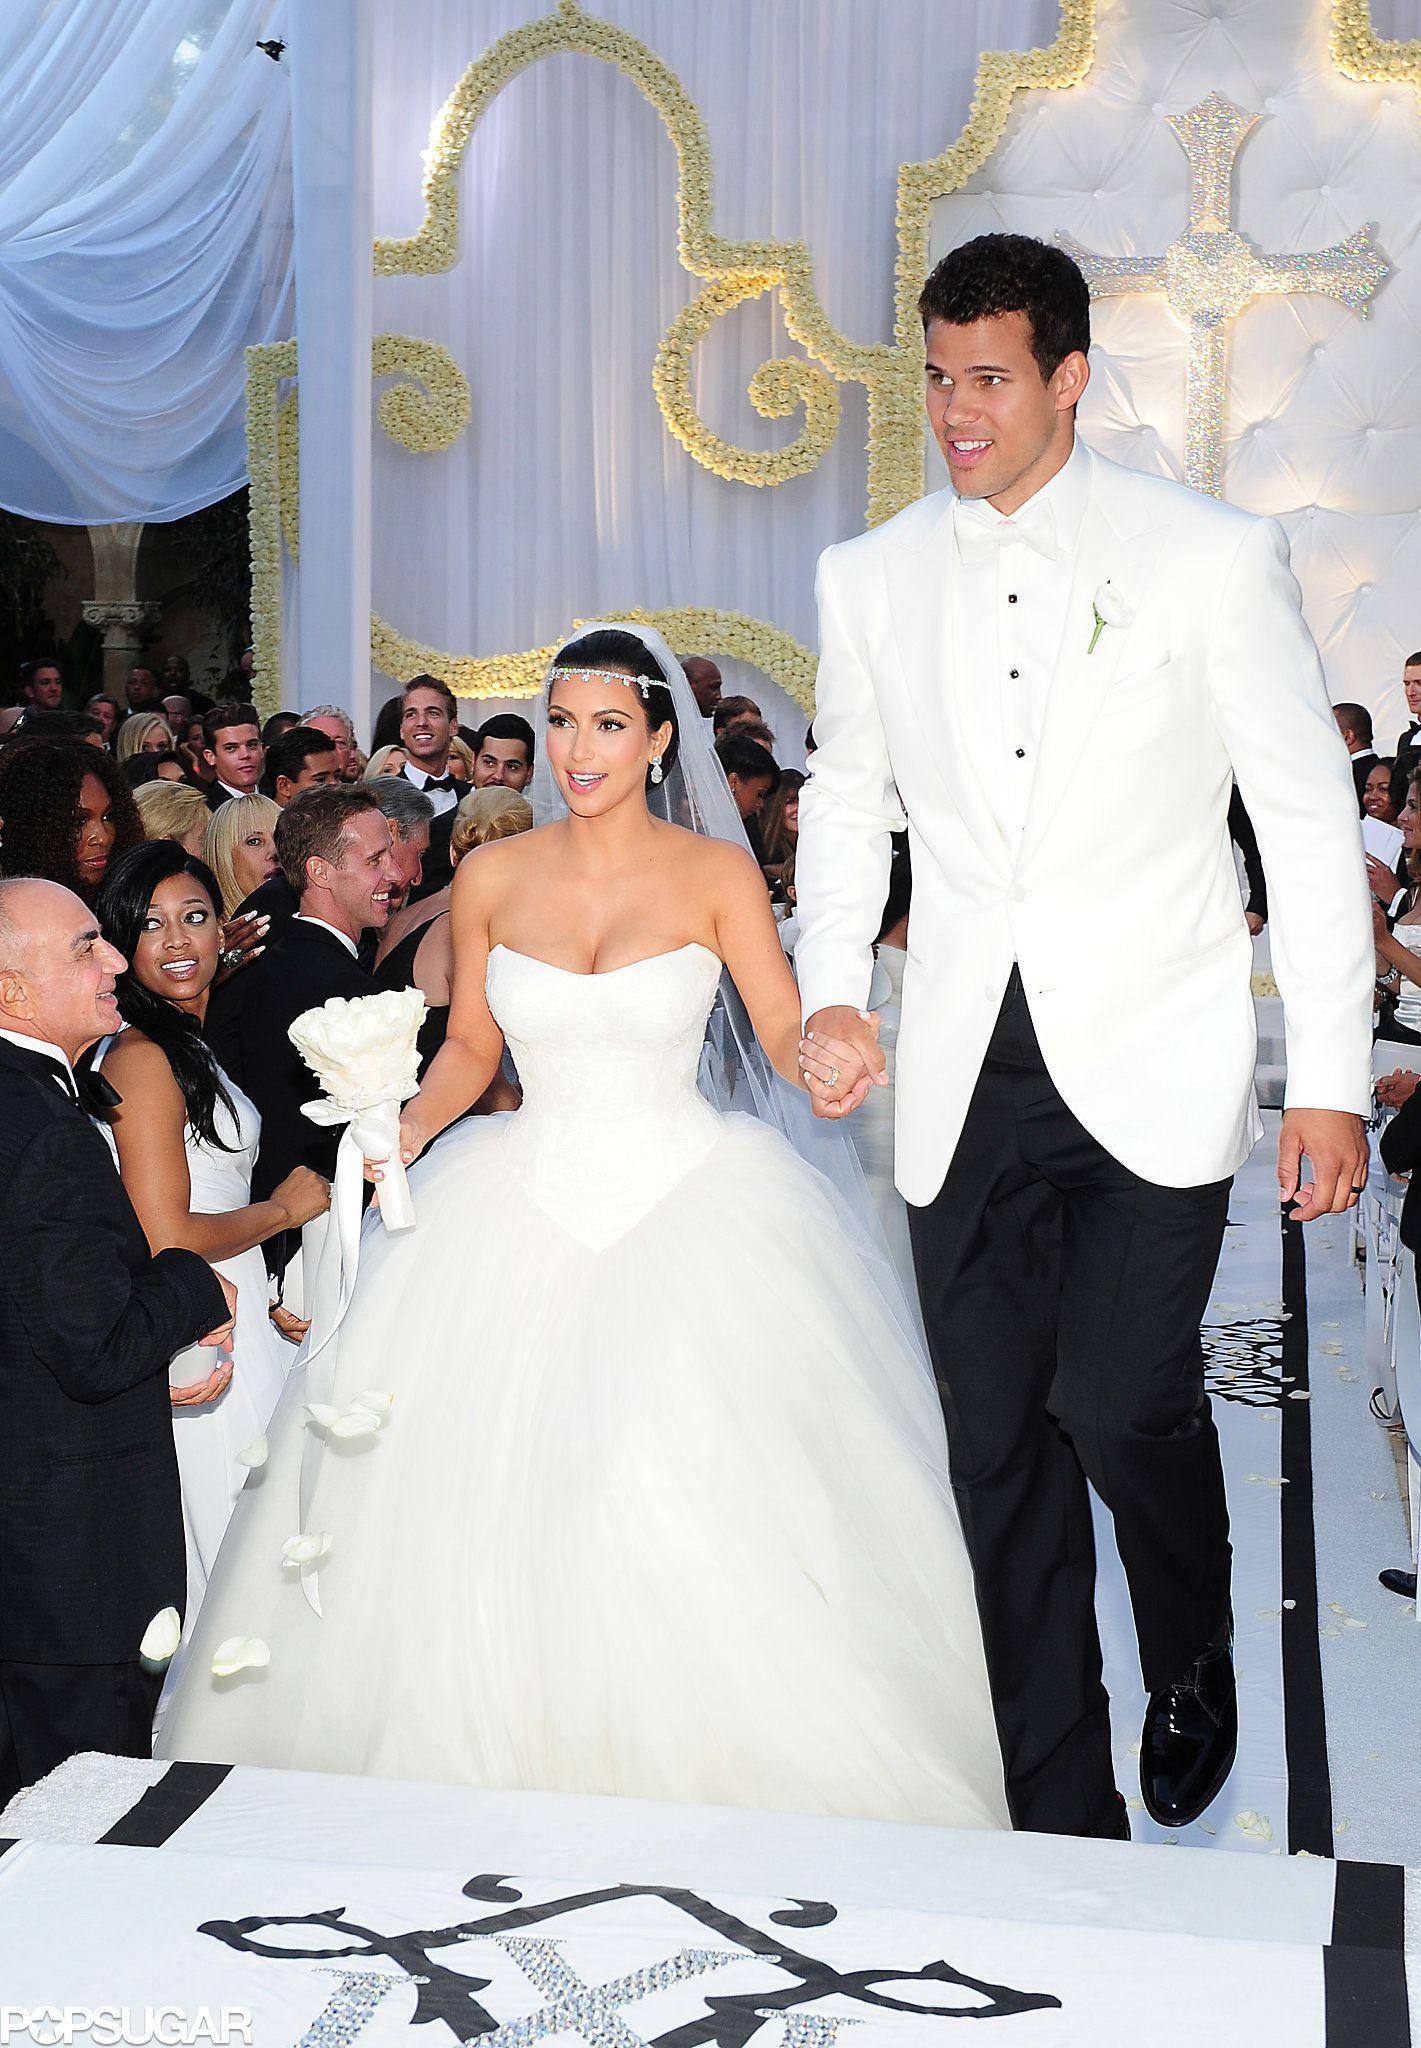 Kim And Kris Greeted Their Guests Before Kim Marries Kanye Take A Look Back At That Other Wedding She Had Kim Kardashian Wedding Dress Kim Kardashian Wedding Kardashian Wedding [ 2048 x 1421 Pixel ]